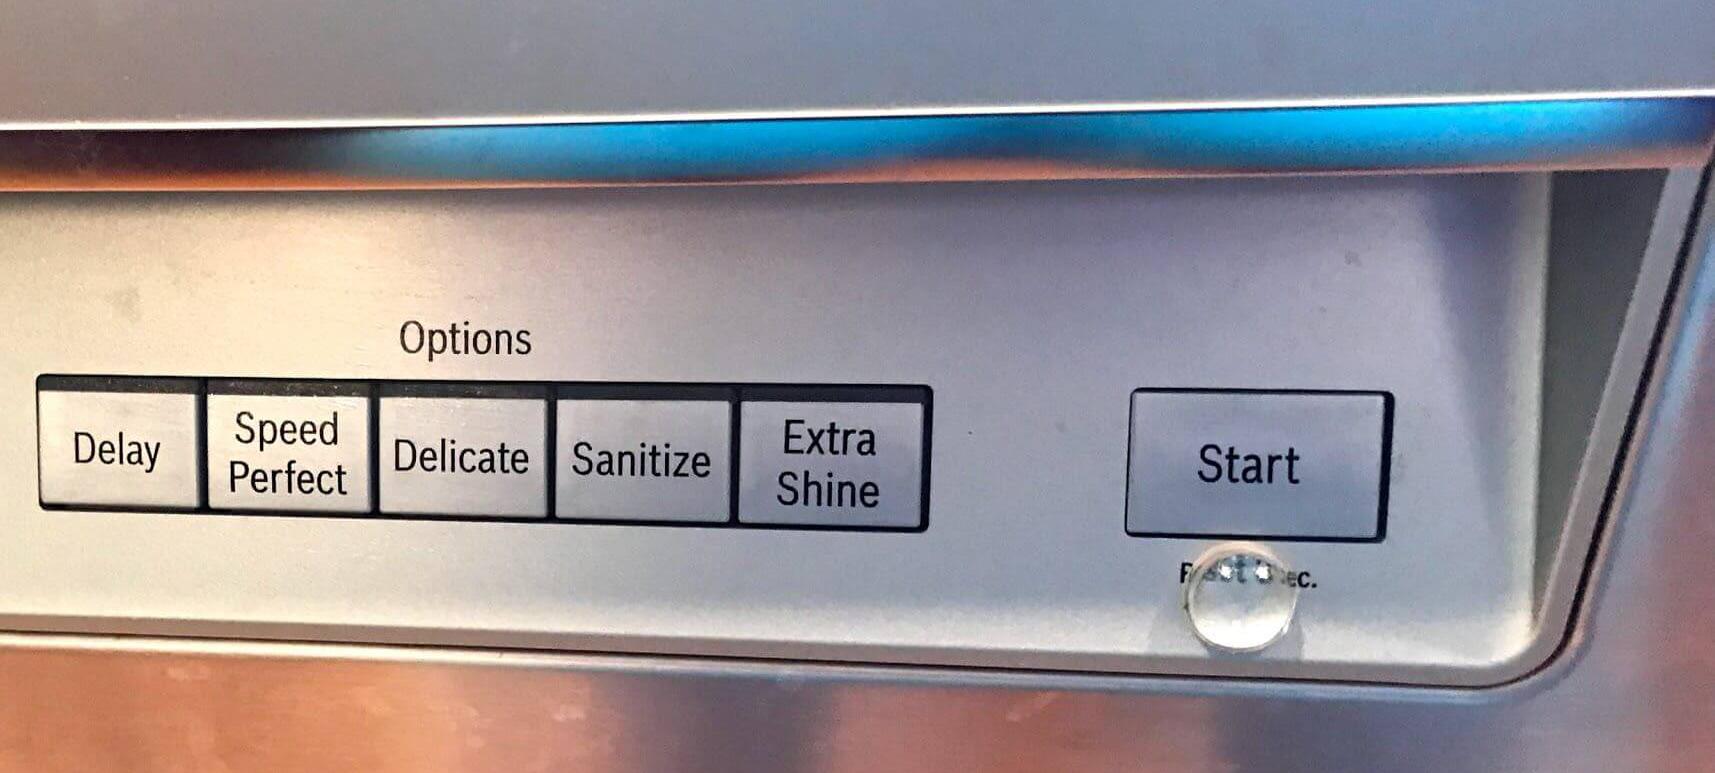 پنل ماشین ظرفشویی